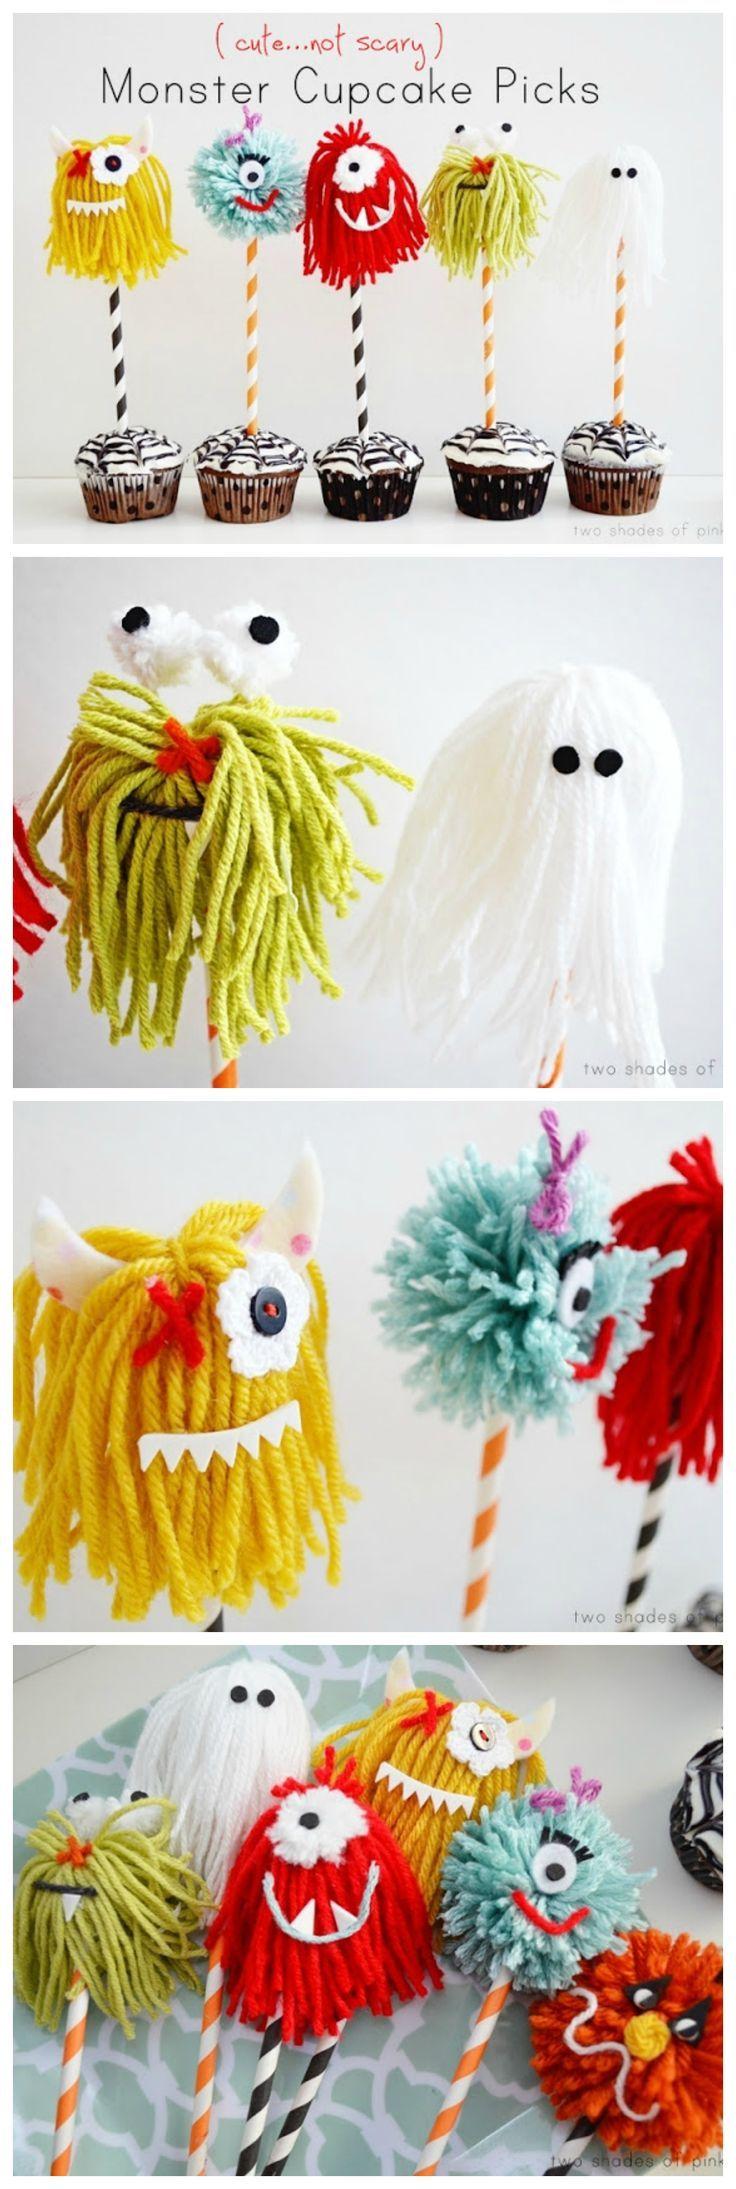 Monster Cupcake Picks   Cutest Halloween Crafts!